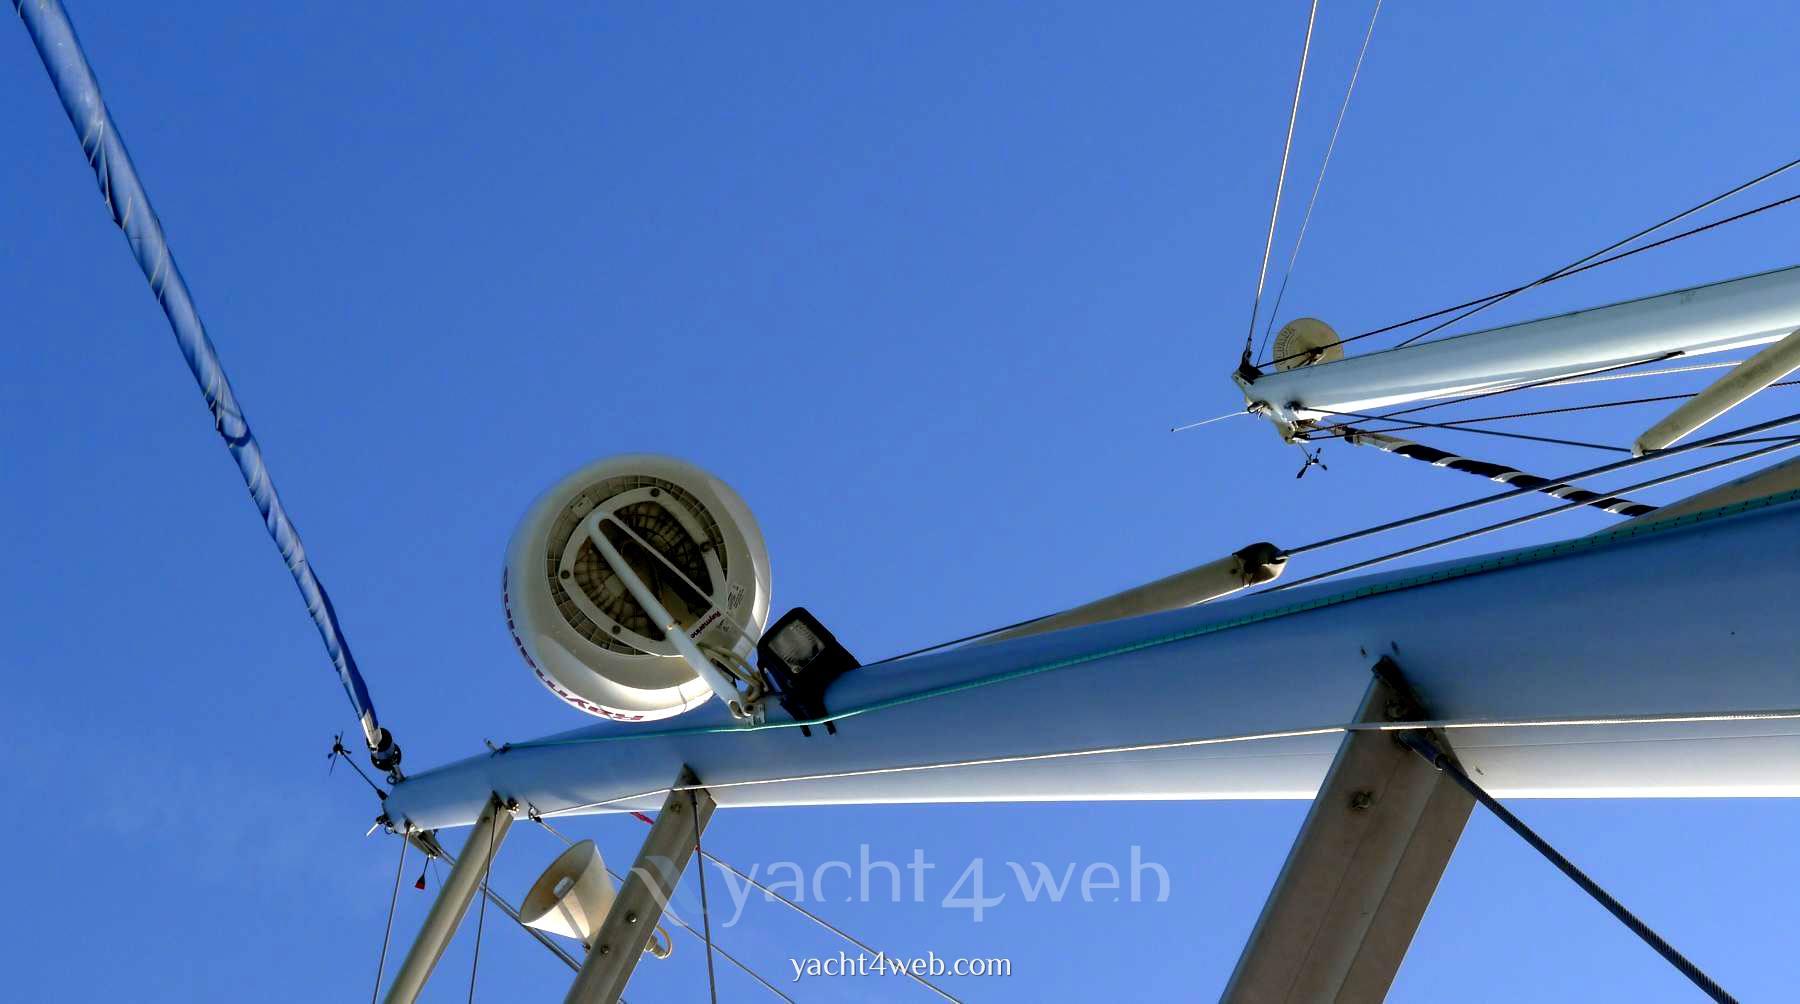 Cantieri Del Pardo Grand soleil 45 Sailing boat used for sale